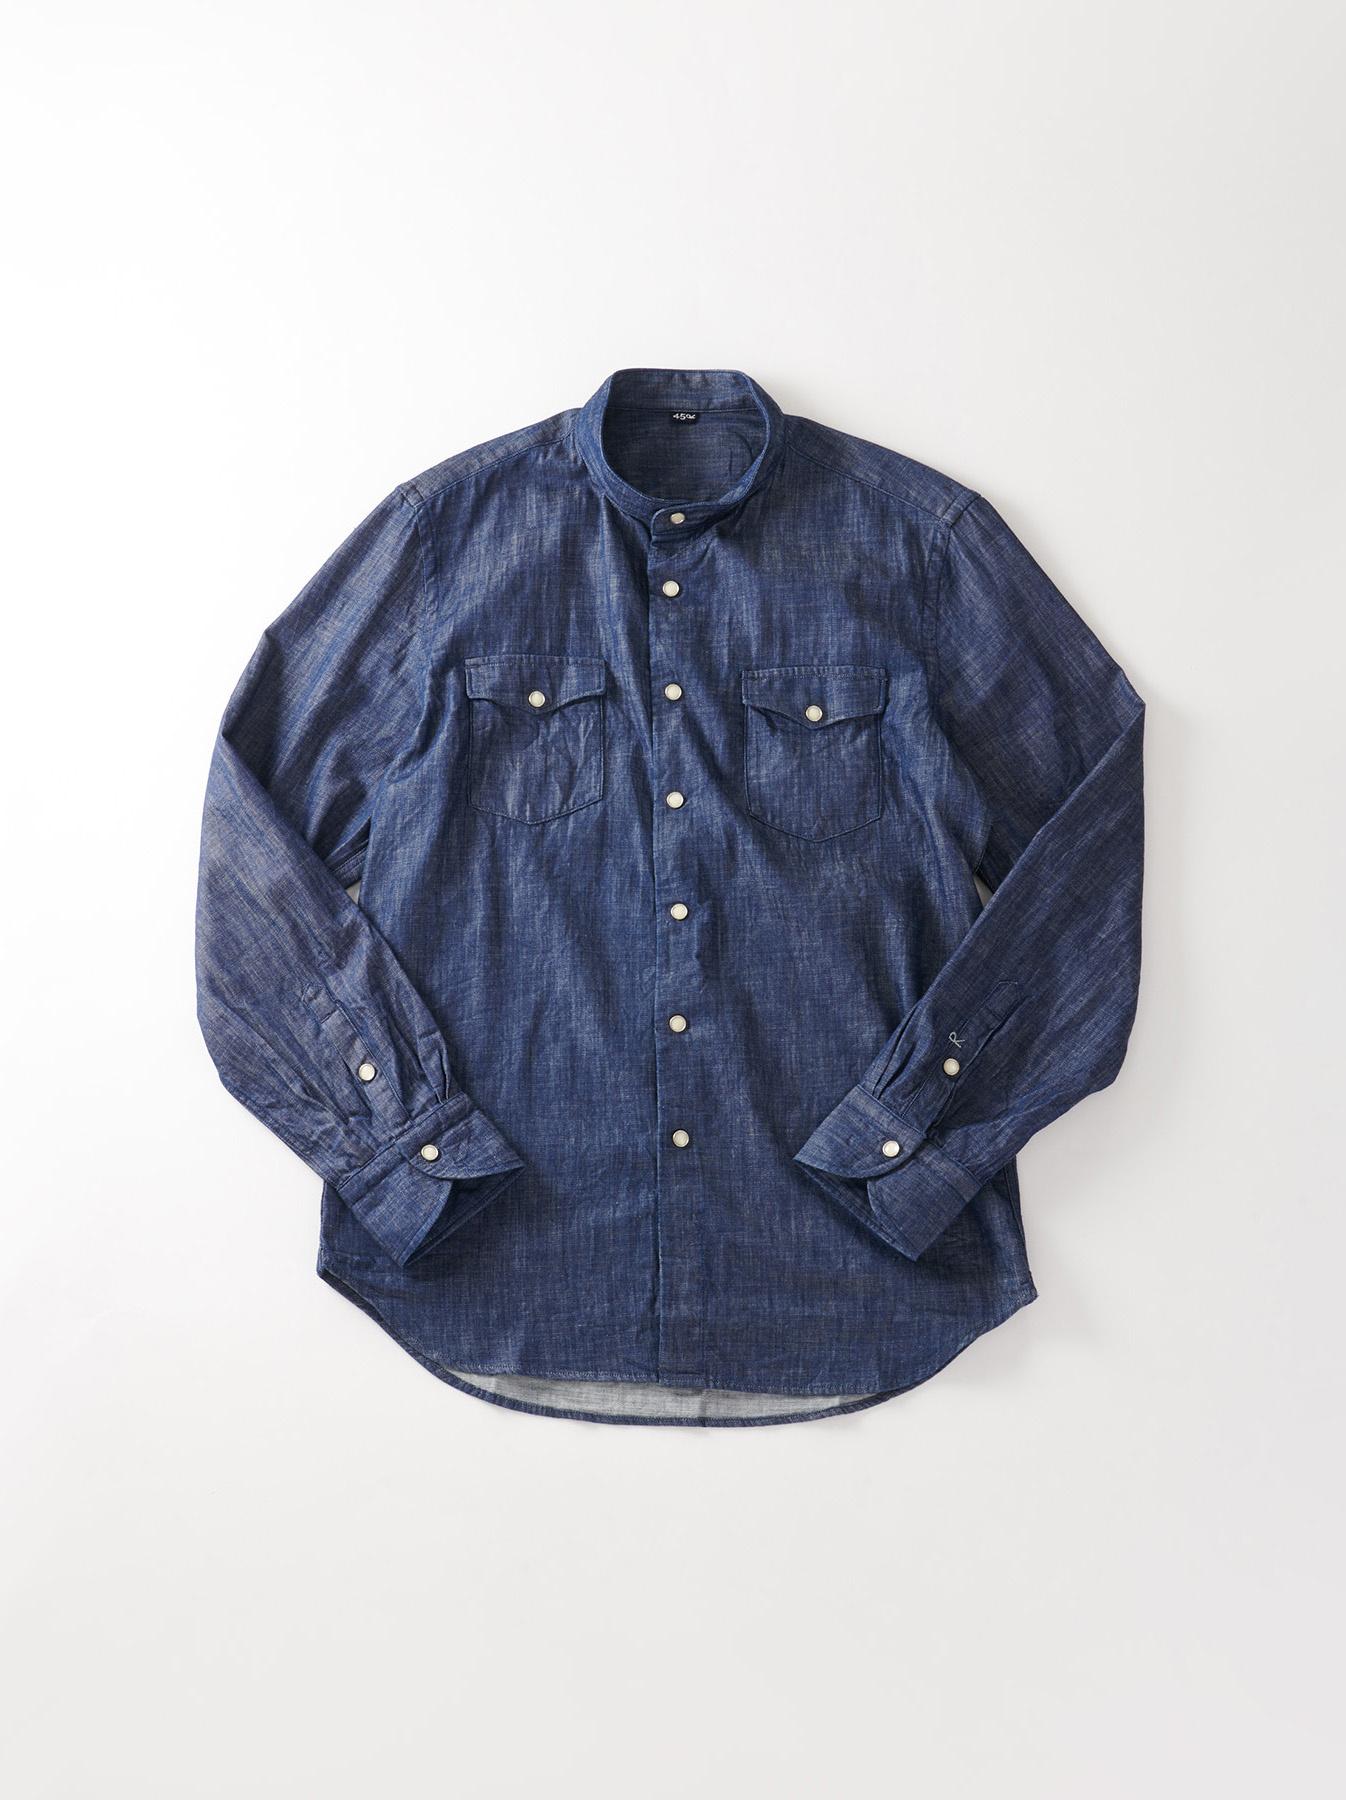 Goma Denim Stand Collar Eastern Shirt-1